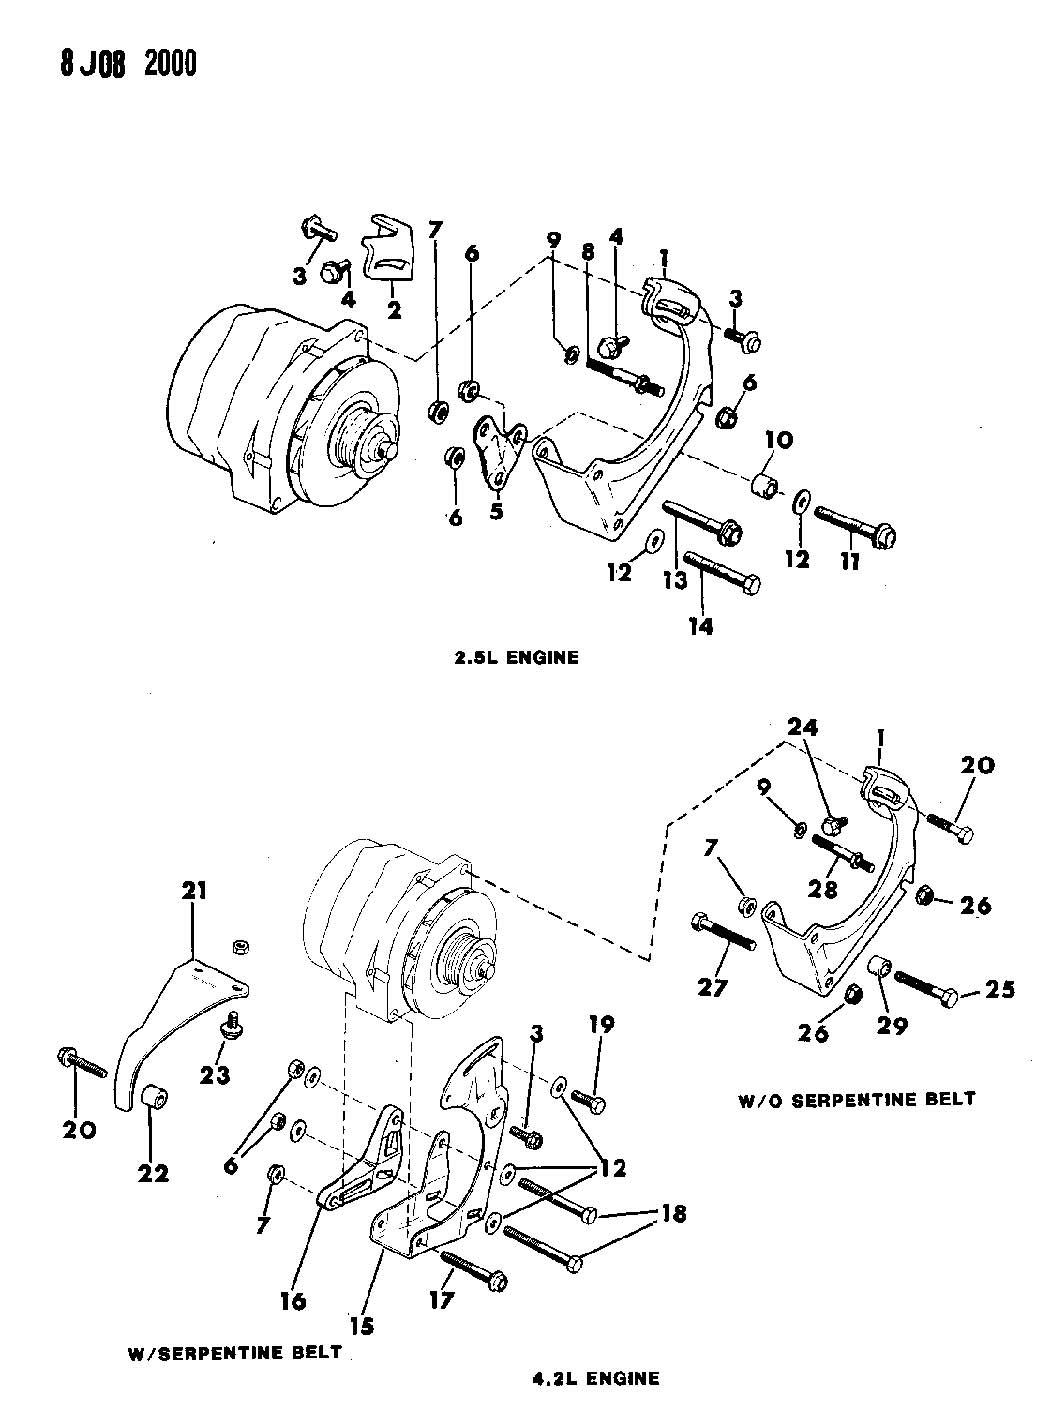 1990 Jeep Wrangler Fuse Box Location - Wiring Diagram Schema